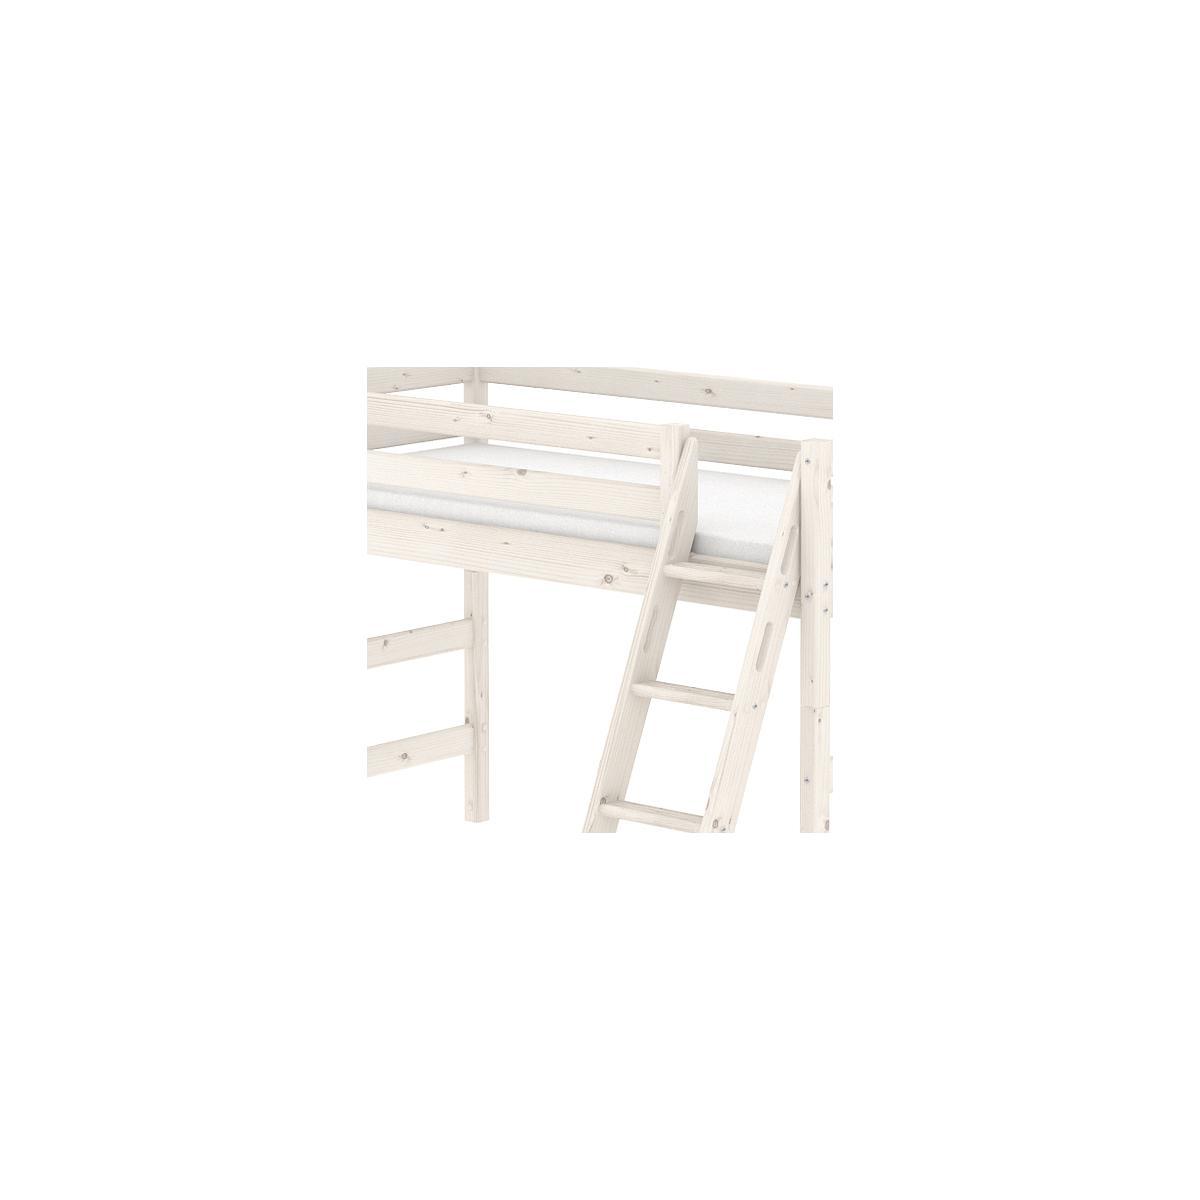 Cama semi alta 90x200 CLASSIC Flexa escalera inclinada blanco cal